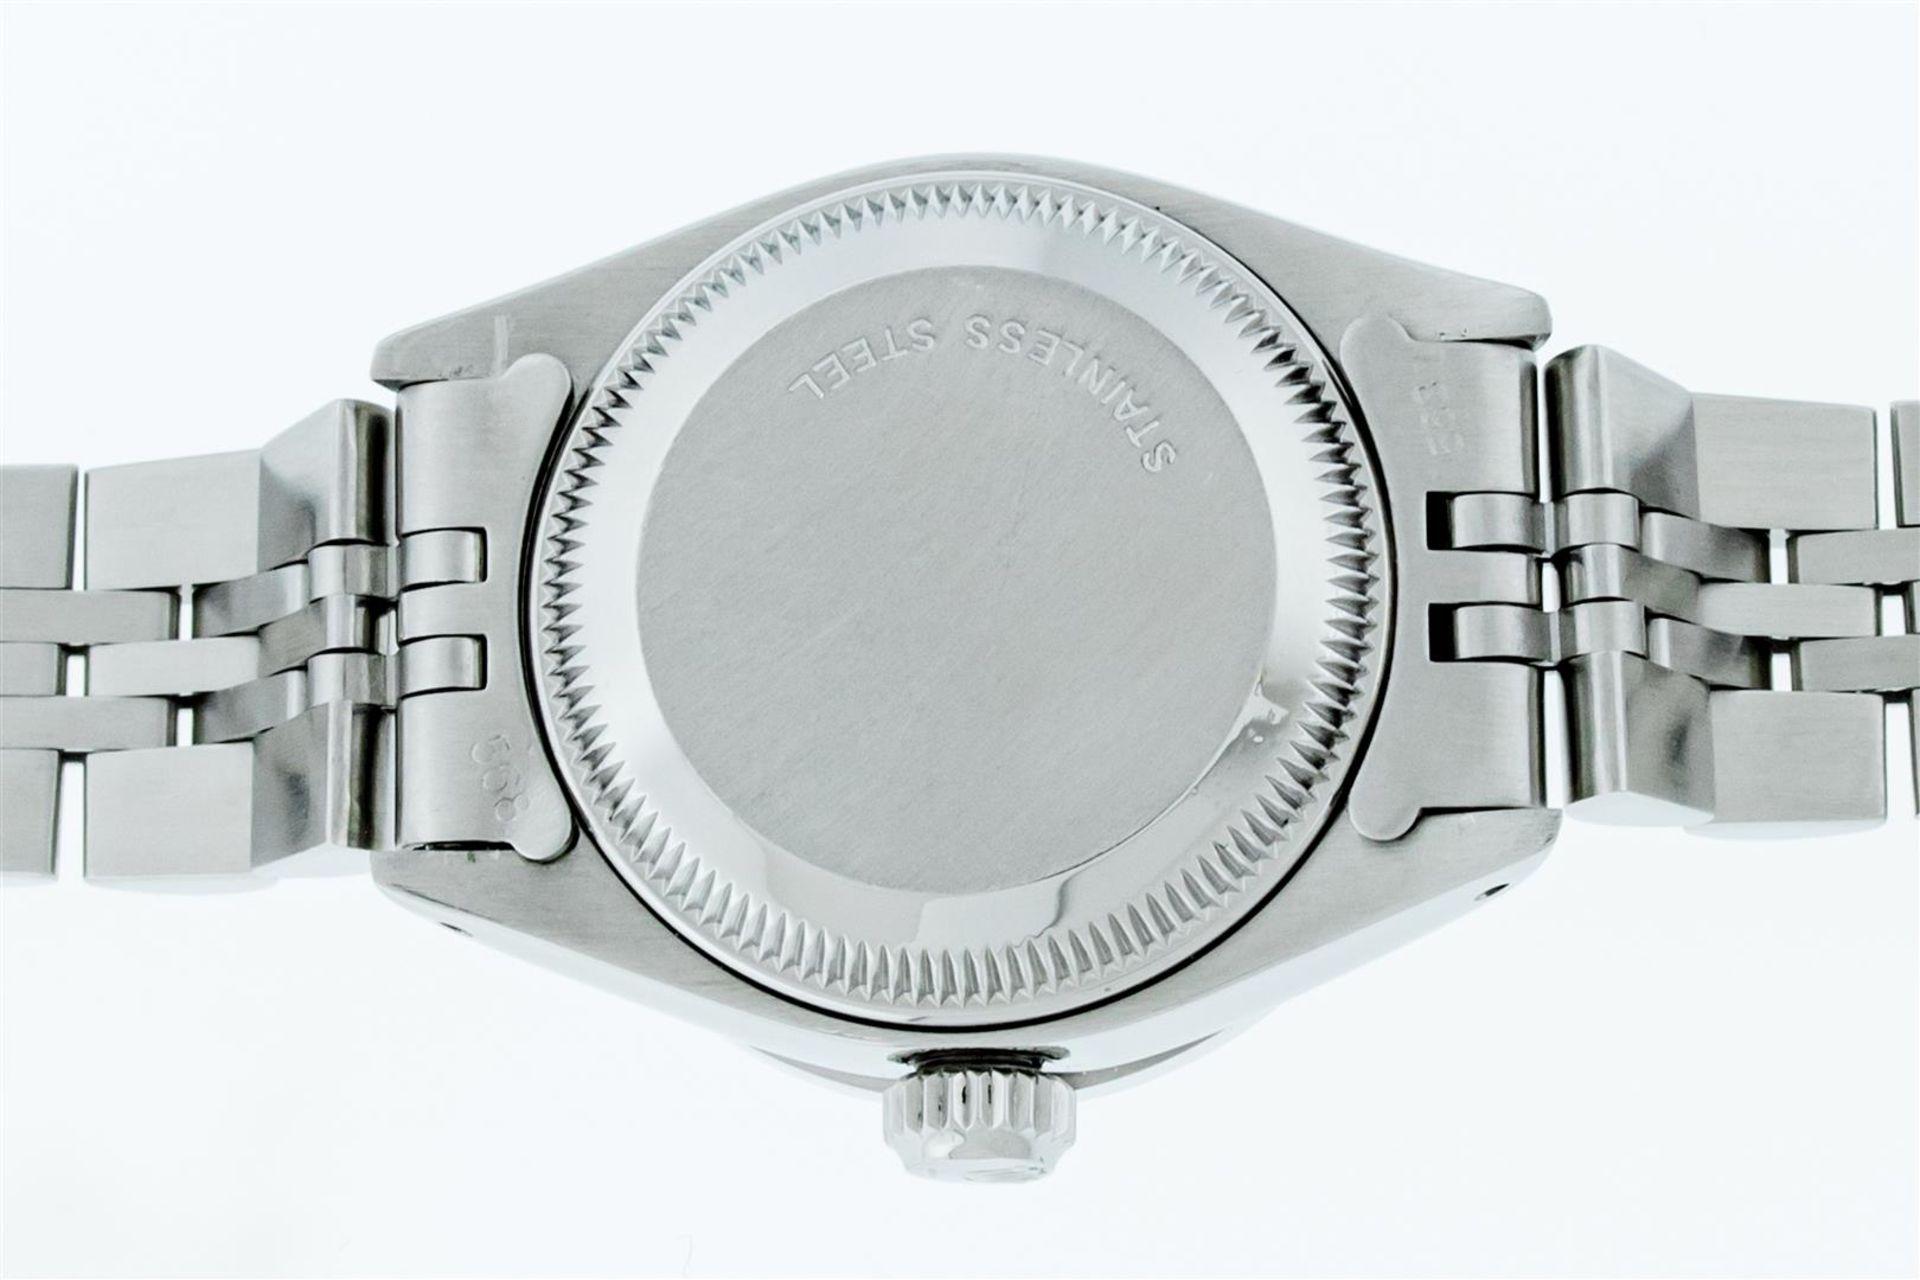 Rolex Ladies Stainless Steel Blue VVS Diamond & Sapphire Datejust Wristwatch - Image 9 of 9